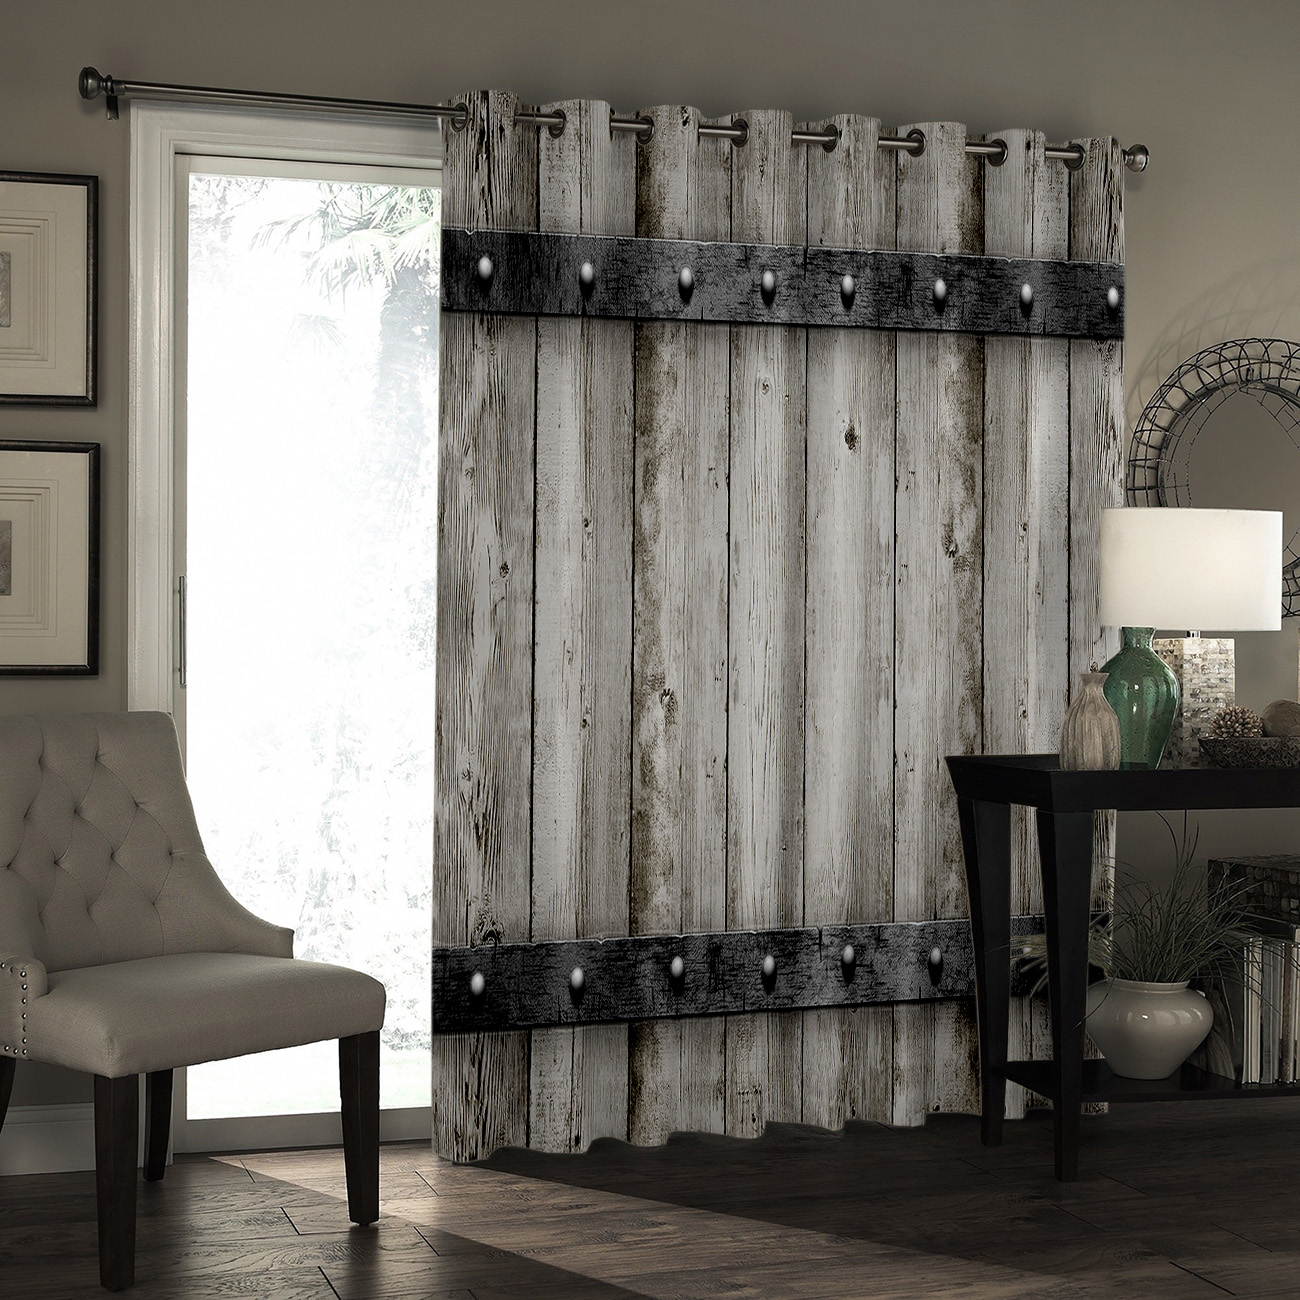 Wood Metal Window Treatments Curtains Valance Window Blinds Living Room  Bedroom Fabric Decor Window Treatment Ideas Curtains